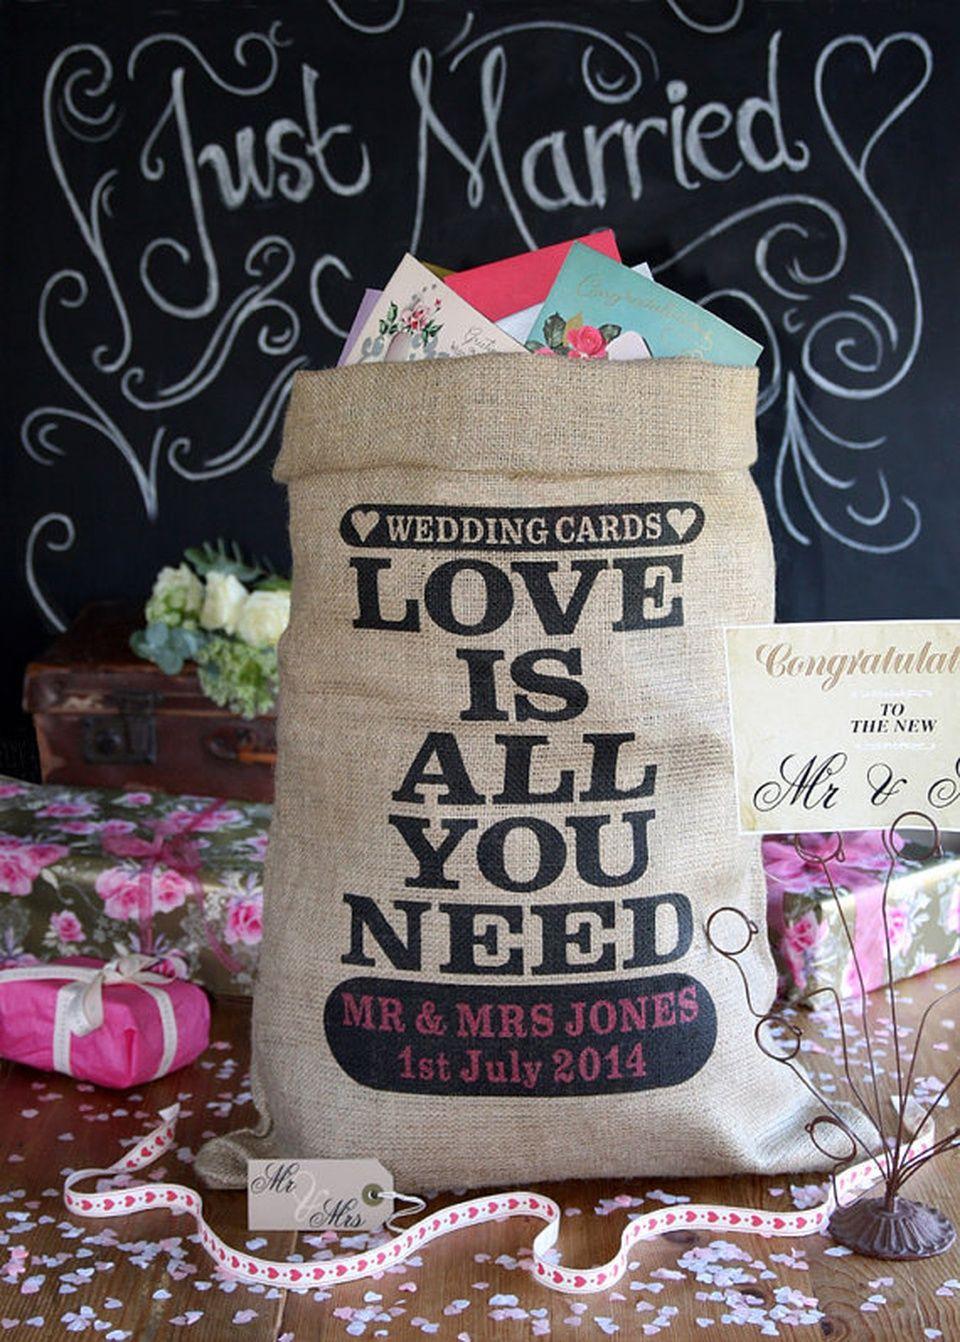 Wedding post box decorations  Handmade Personalized wedding card post box burlap sack for wedding